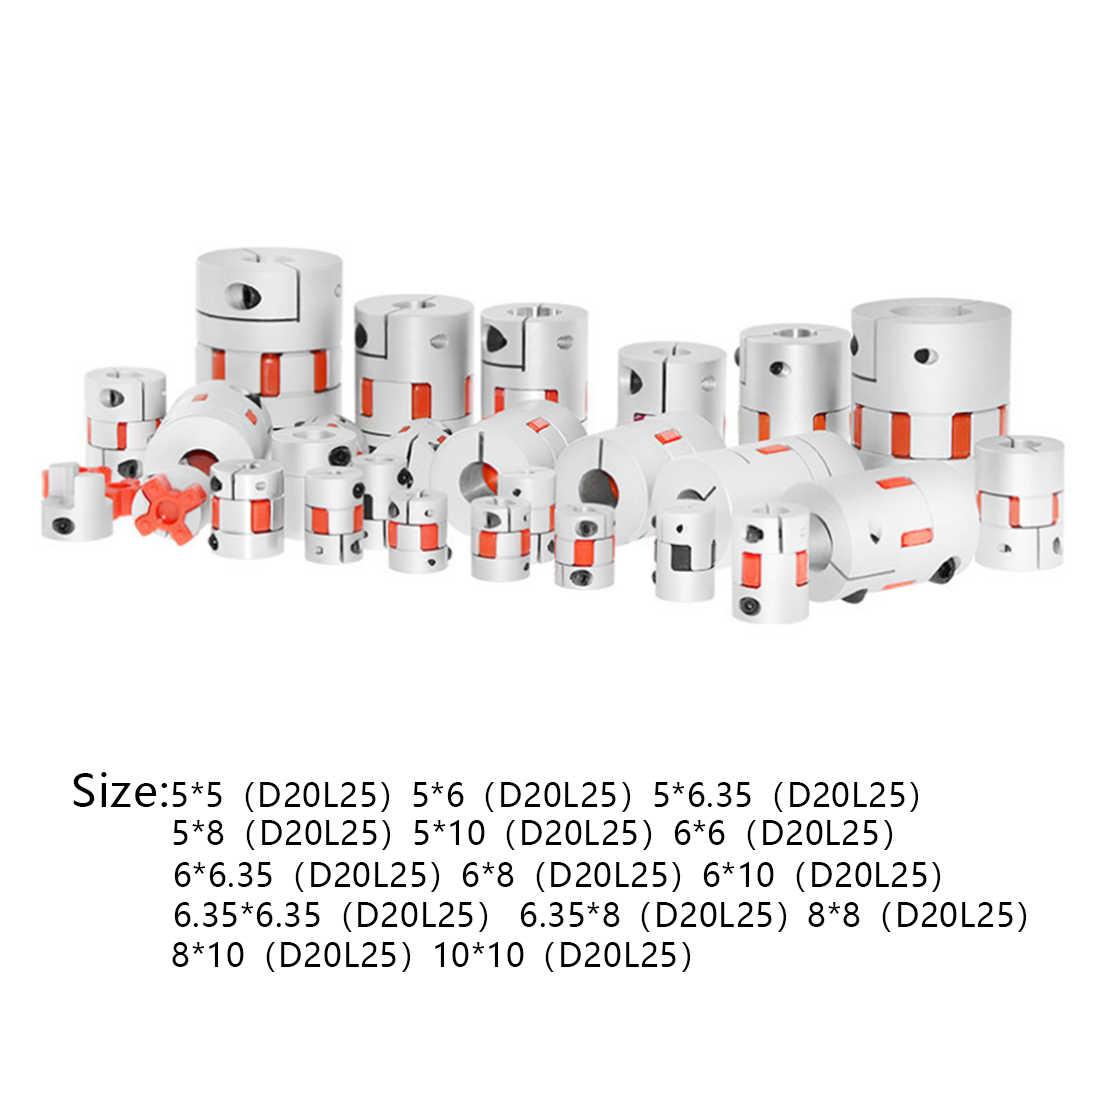 3D Printer Fleksibel Poros Skrup Upgrade Leadtime Coupler untuk CR10/CR10S/Ender 2/Ender3/Tornado/ anet A8